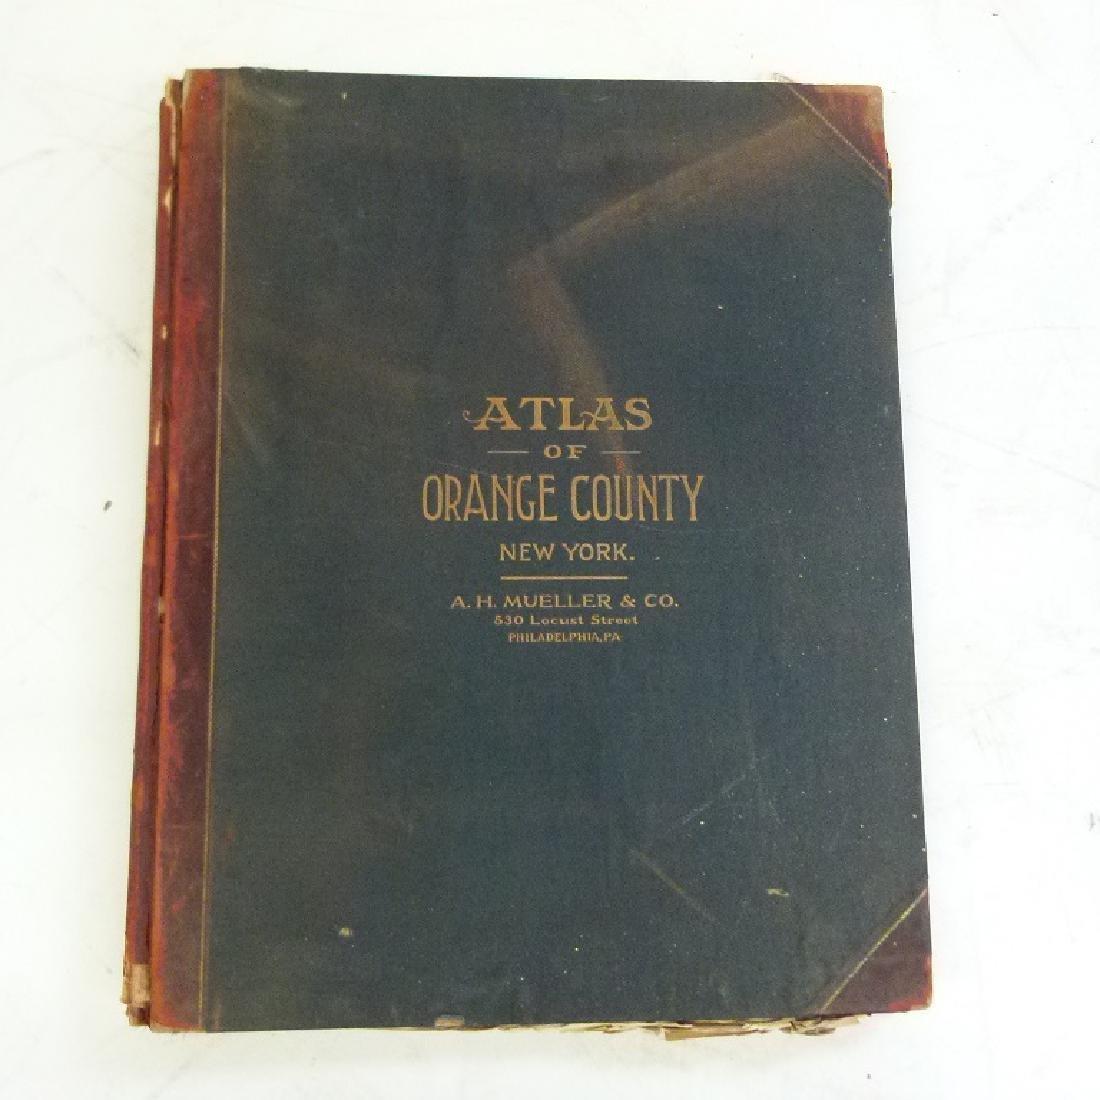 (2)  ATLAS OF ORANGE COUNTY NEW YORK, A.H. MUELLER - 2